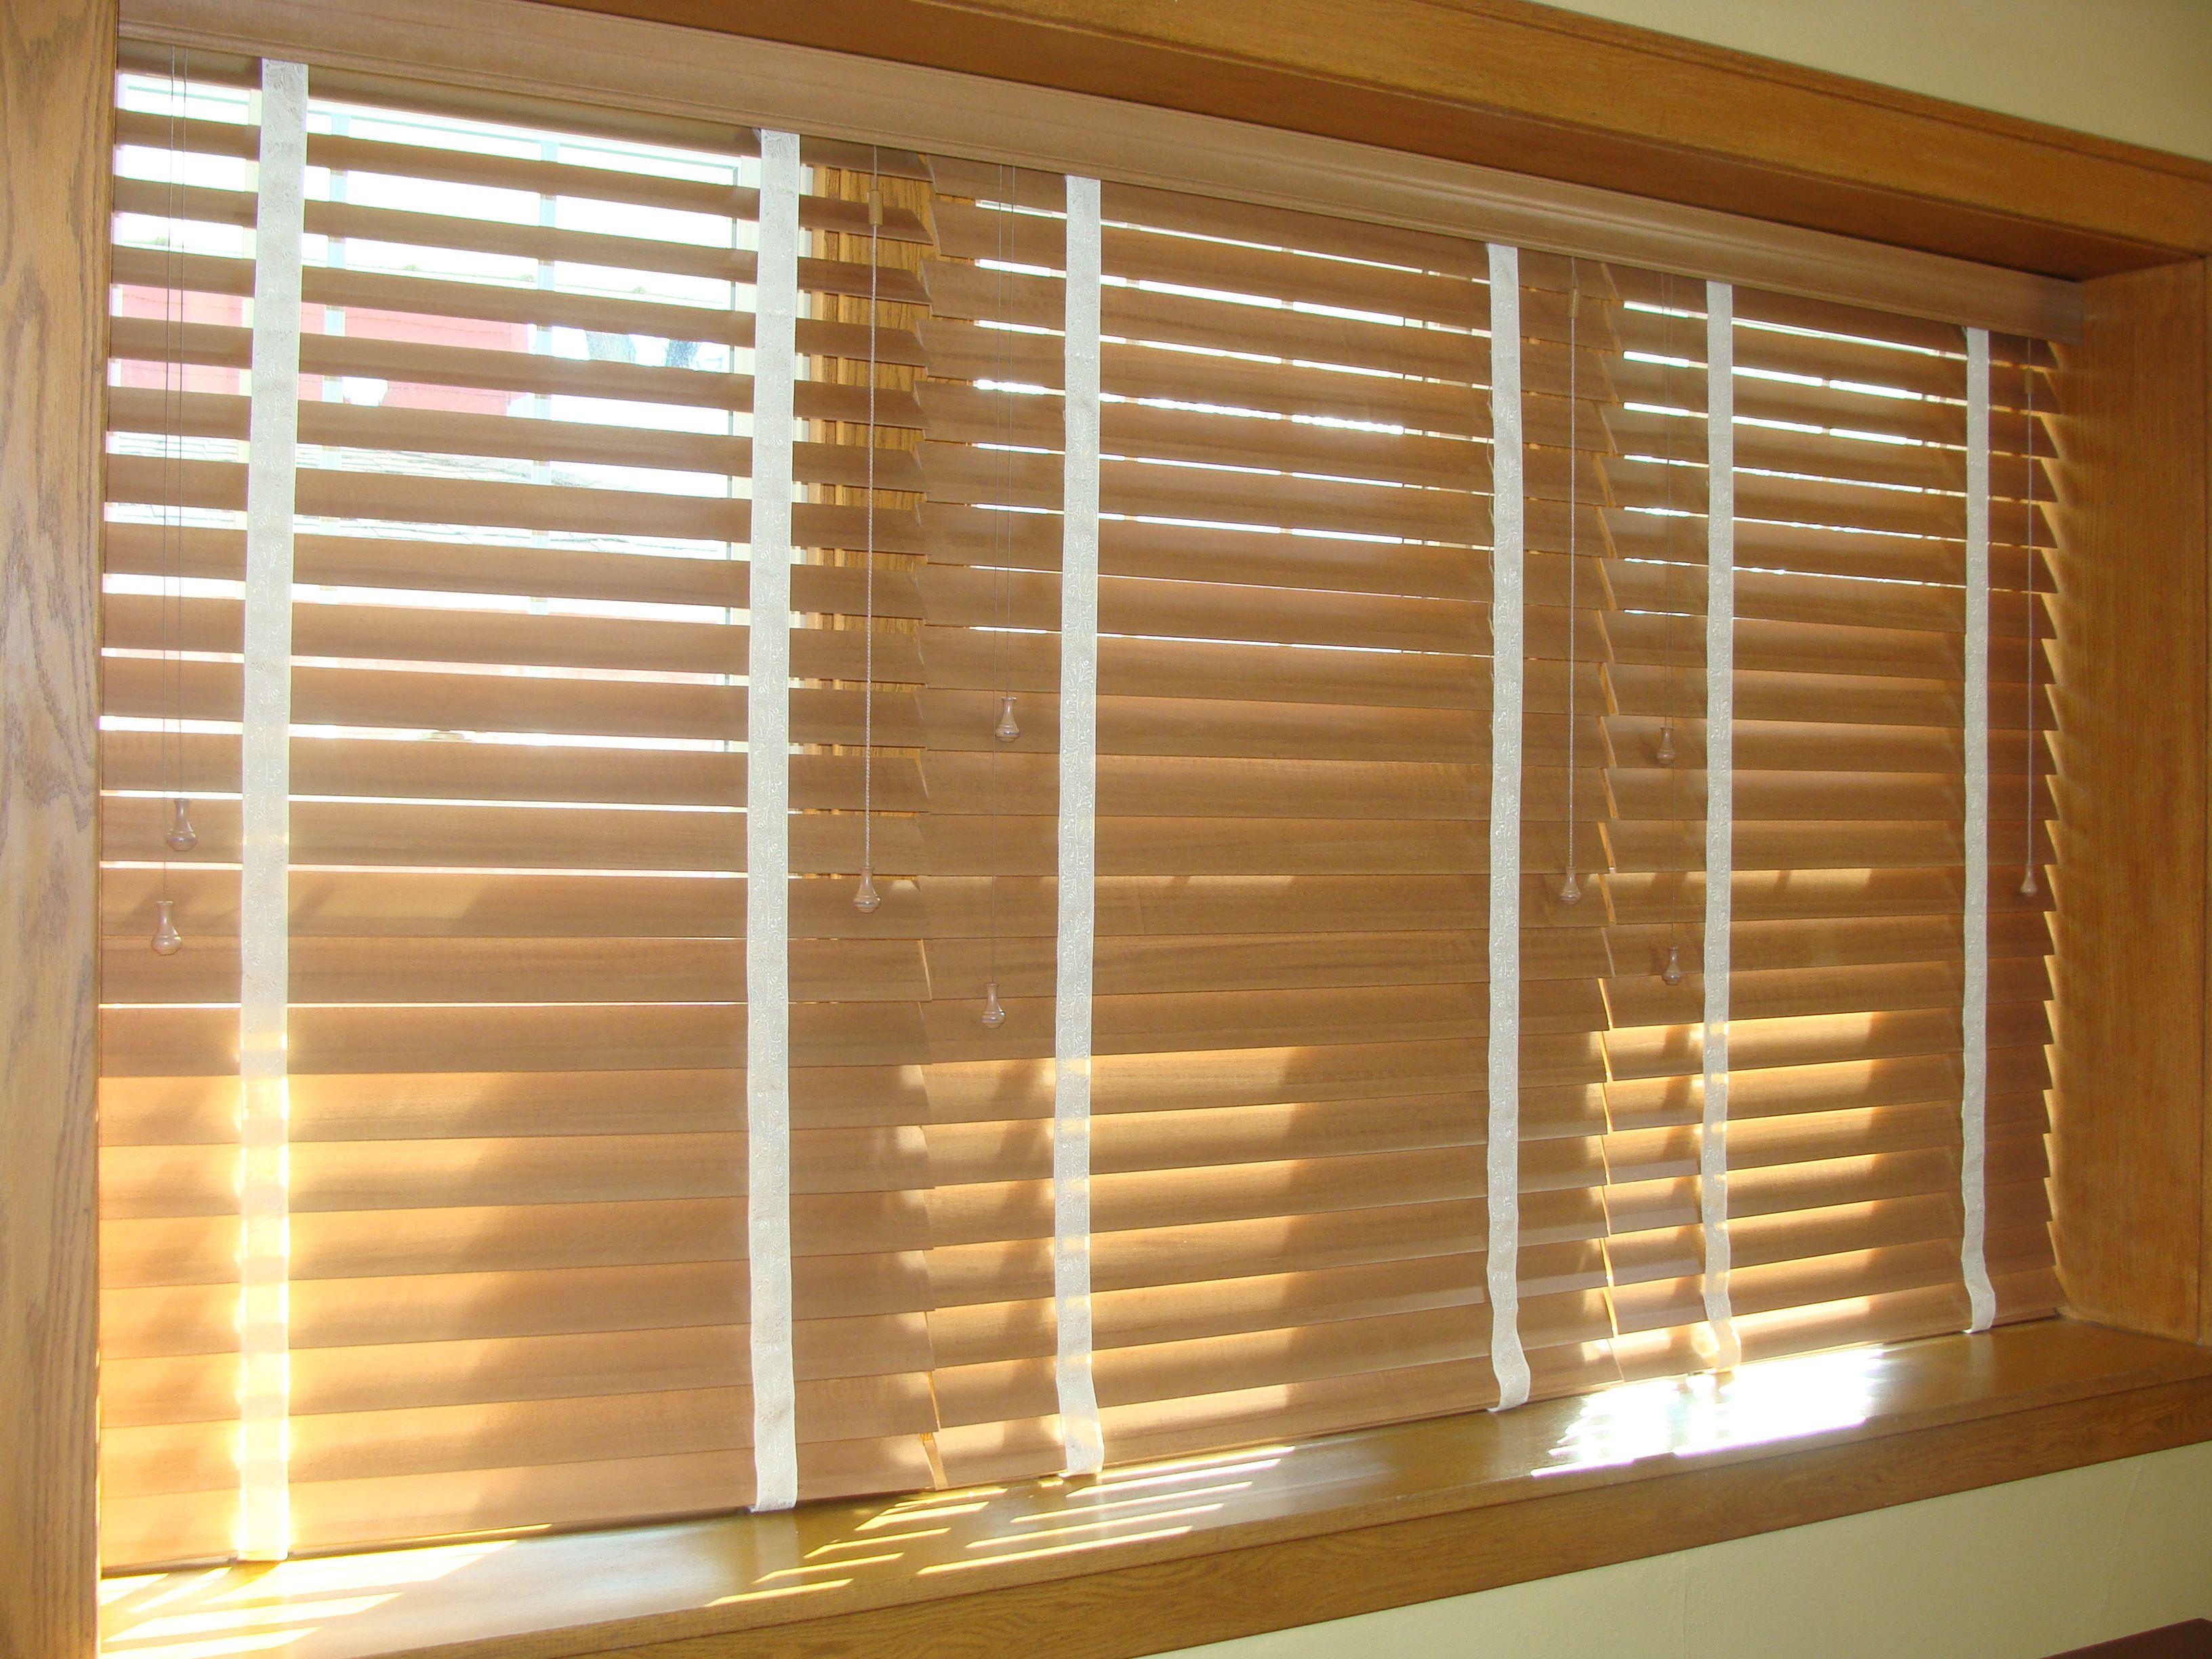 Hunter douglas wood blinds adds character plus functional window